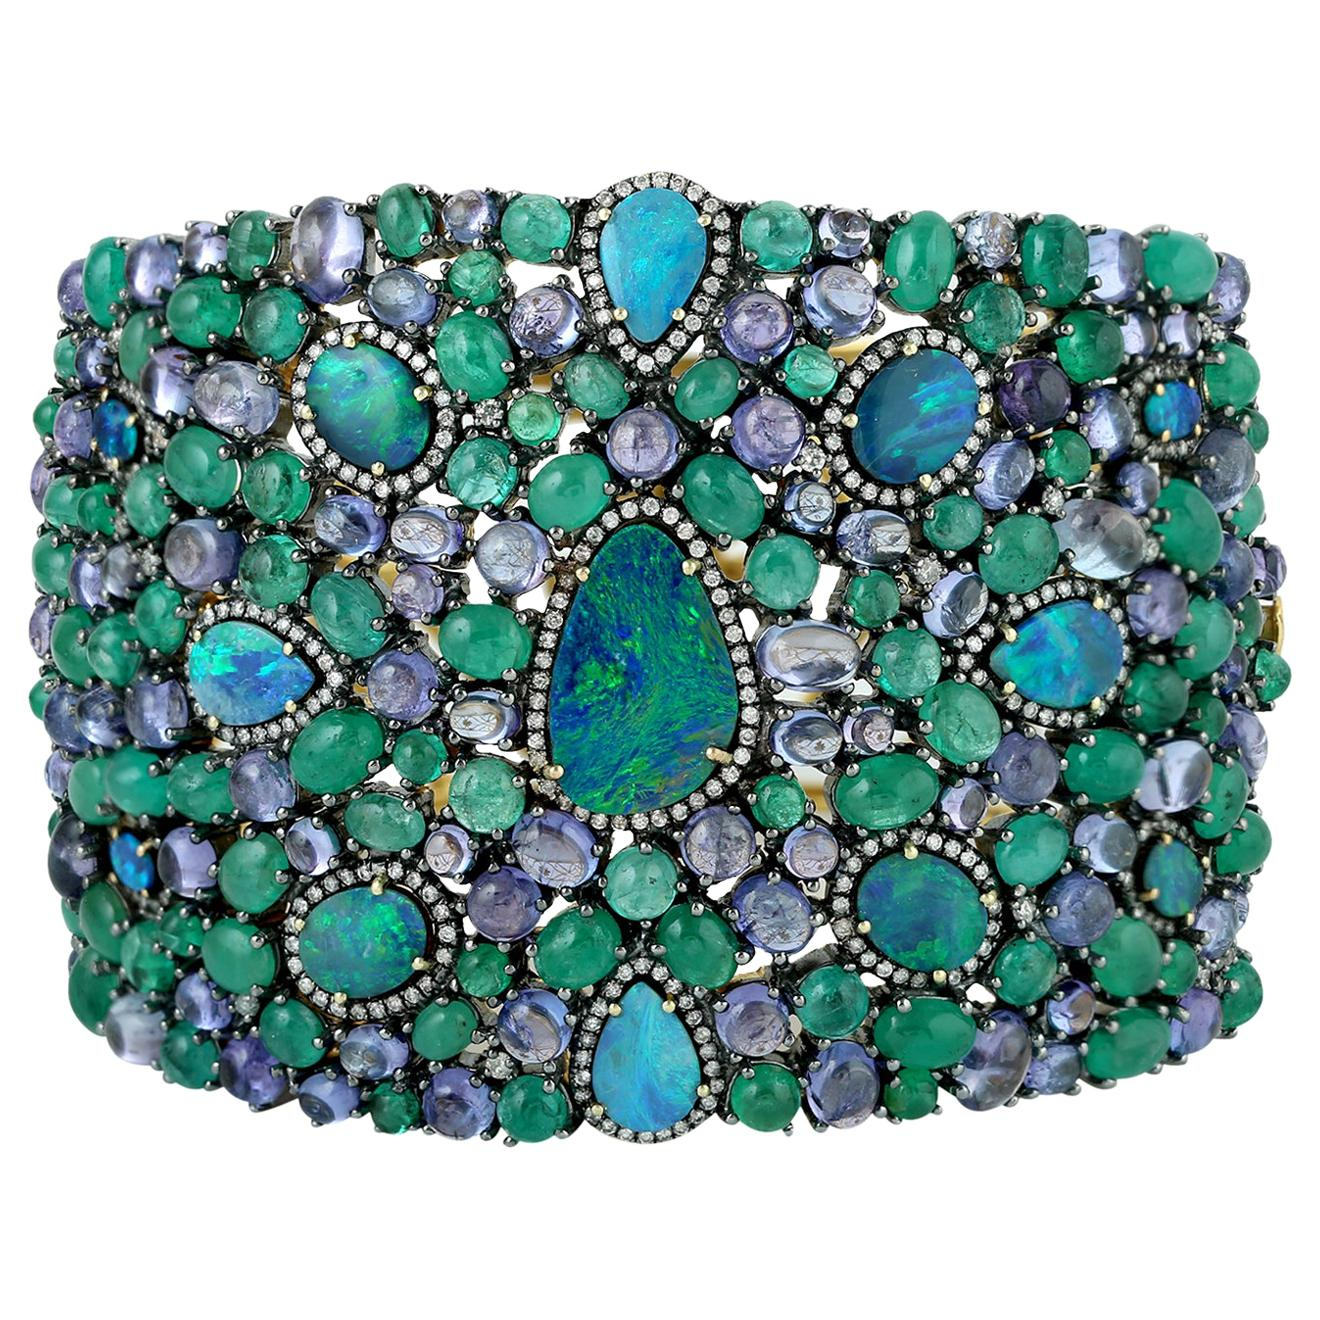 Opal Emerald Tanzanite and Diamond Cuff Bracelet in Gold and Silver